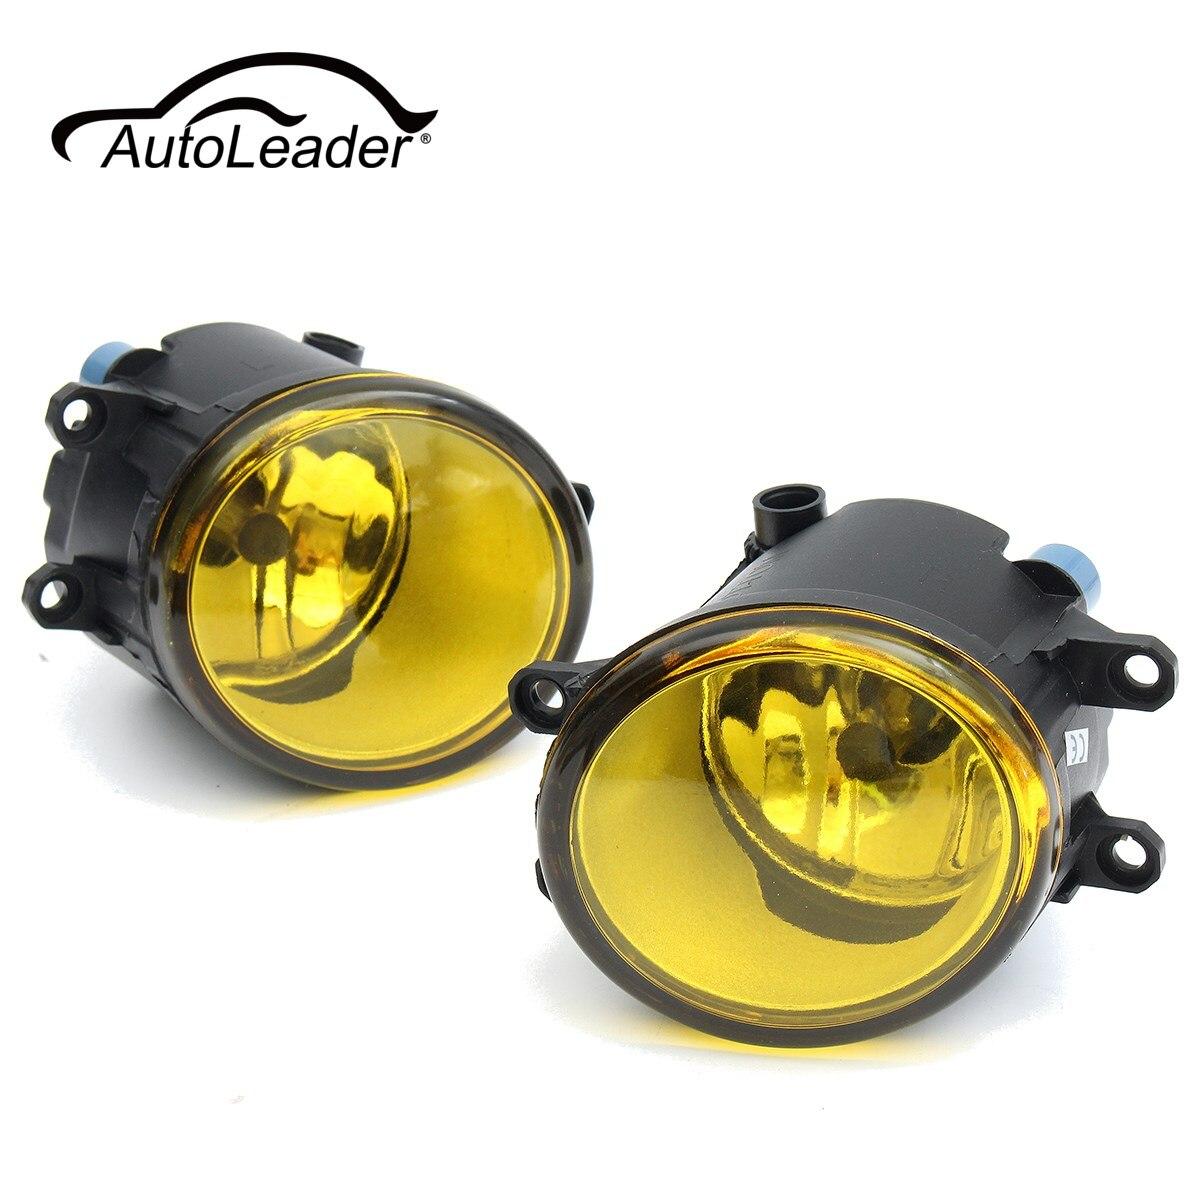 AutoLeader 1 Pair Front Fog Light H11 55W Halogen Bulbs Fog Lights Lamp For Toyota/Camry/Carola/Vios/RAV4